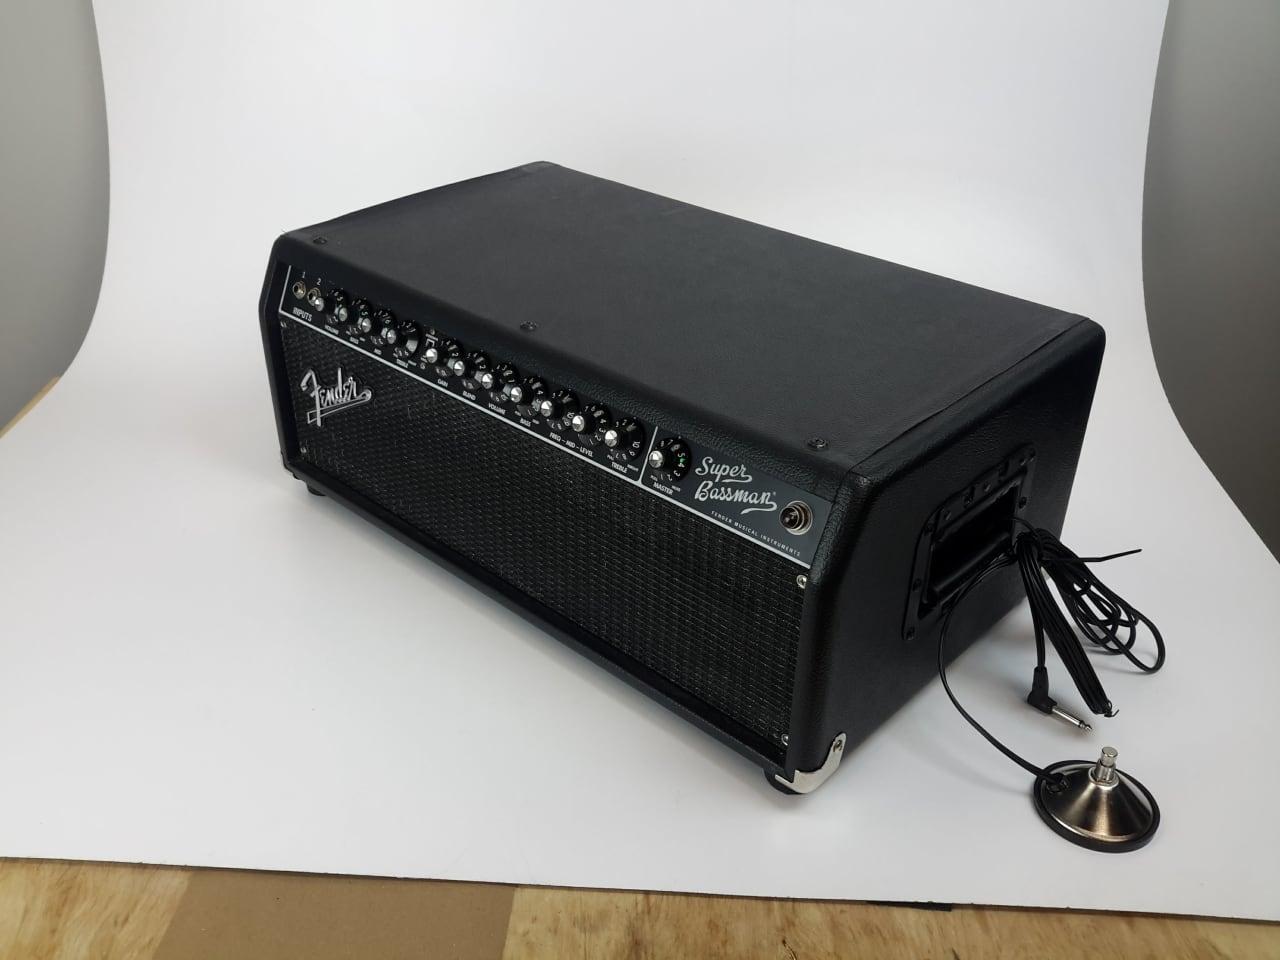 fender super bassman tube head bass amp 300 watts w foot reverb. Black Bedroom Furniture Sets. Home Design Ideas